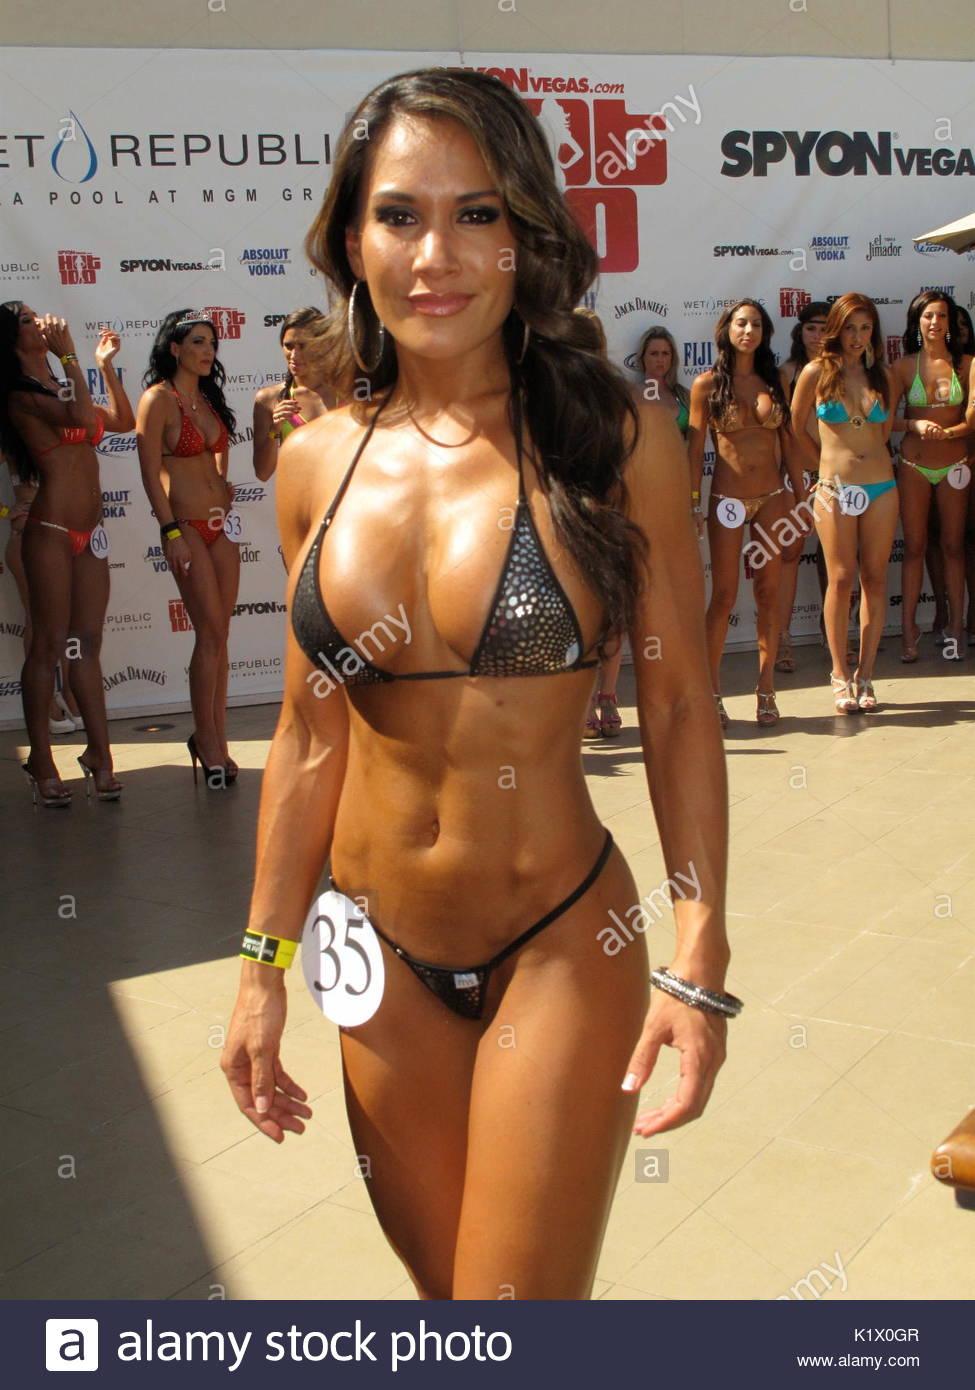 Bikini Contest Model